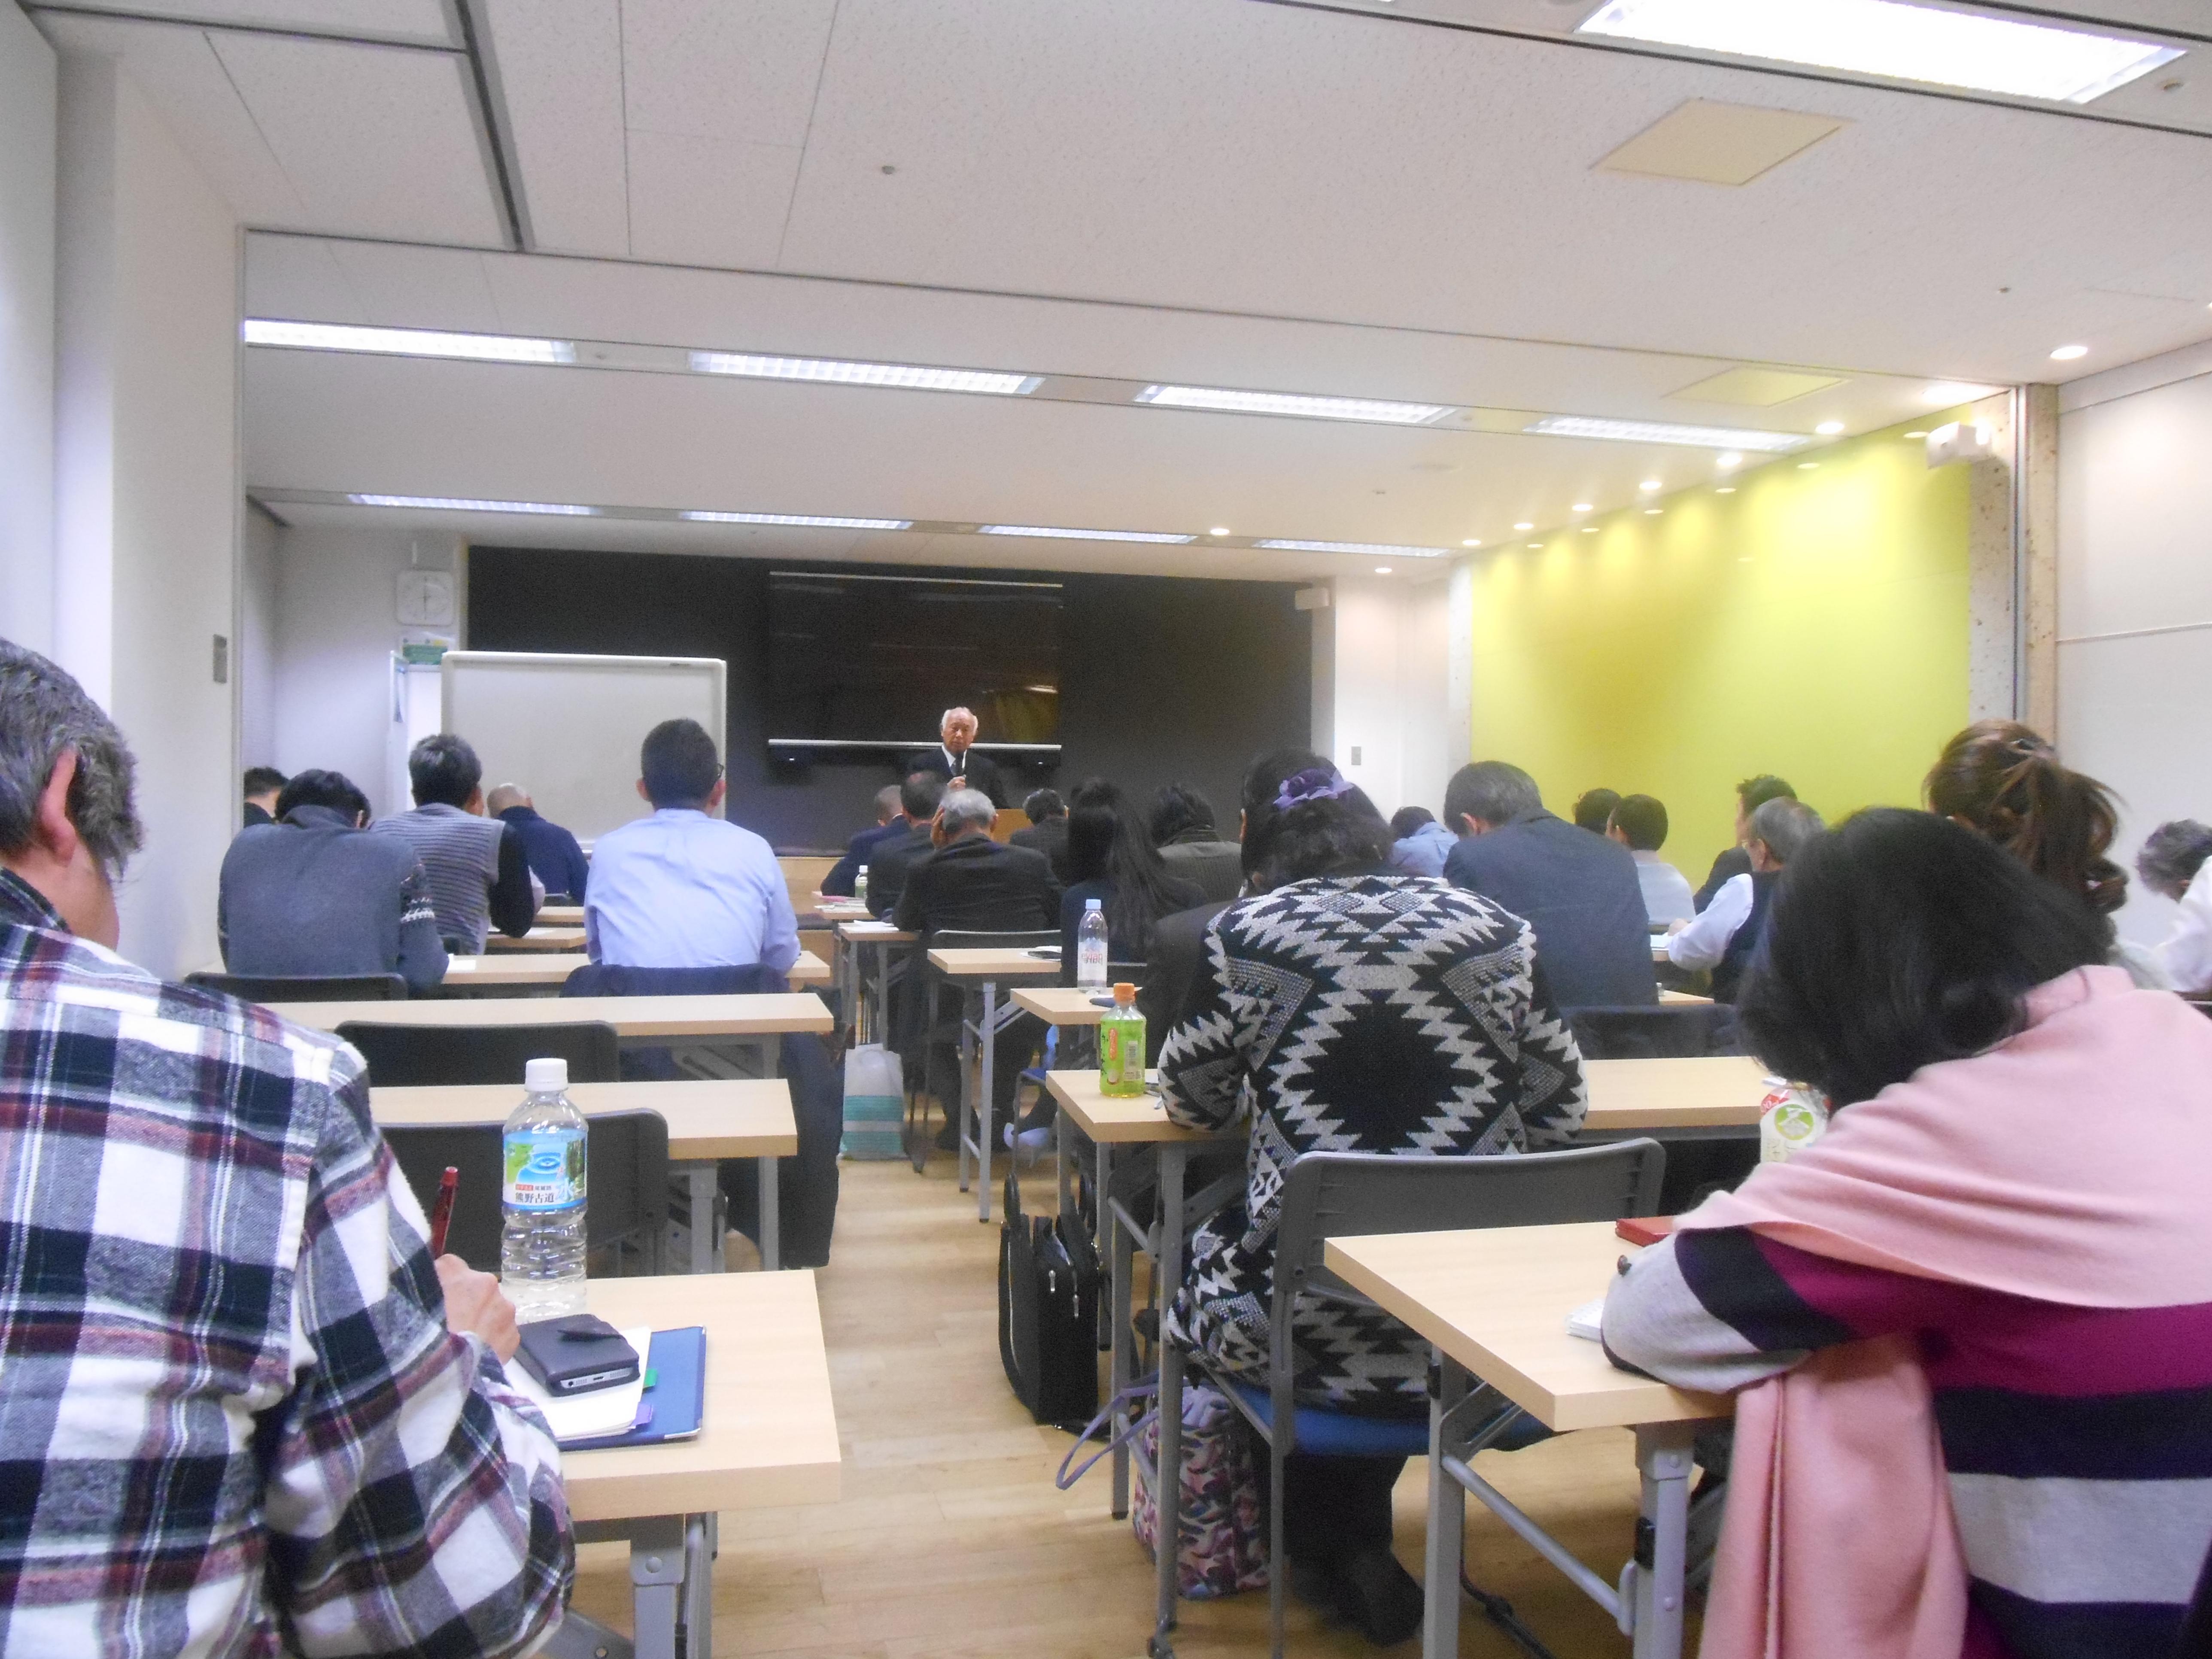 DSCN0056 - 4月1日東京思風塾の開催になります。